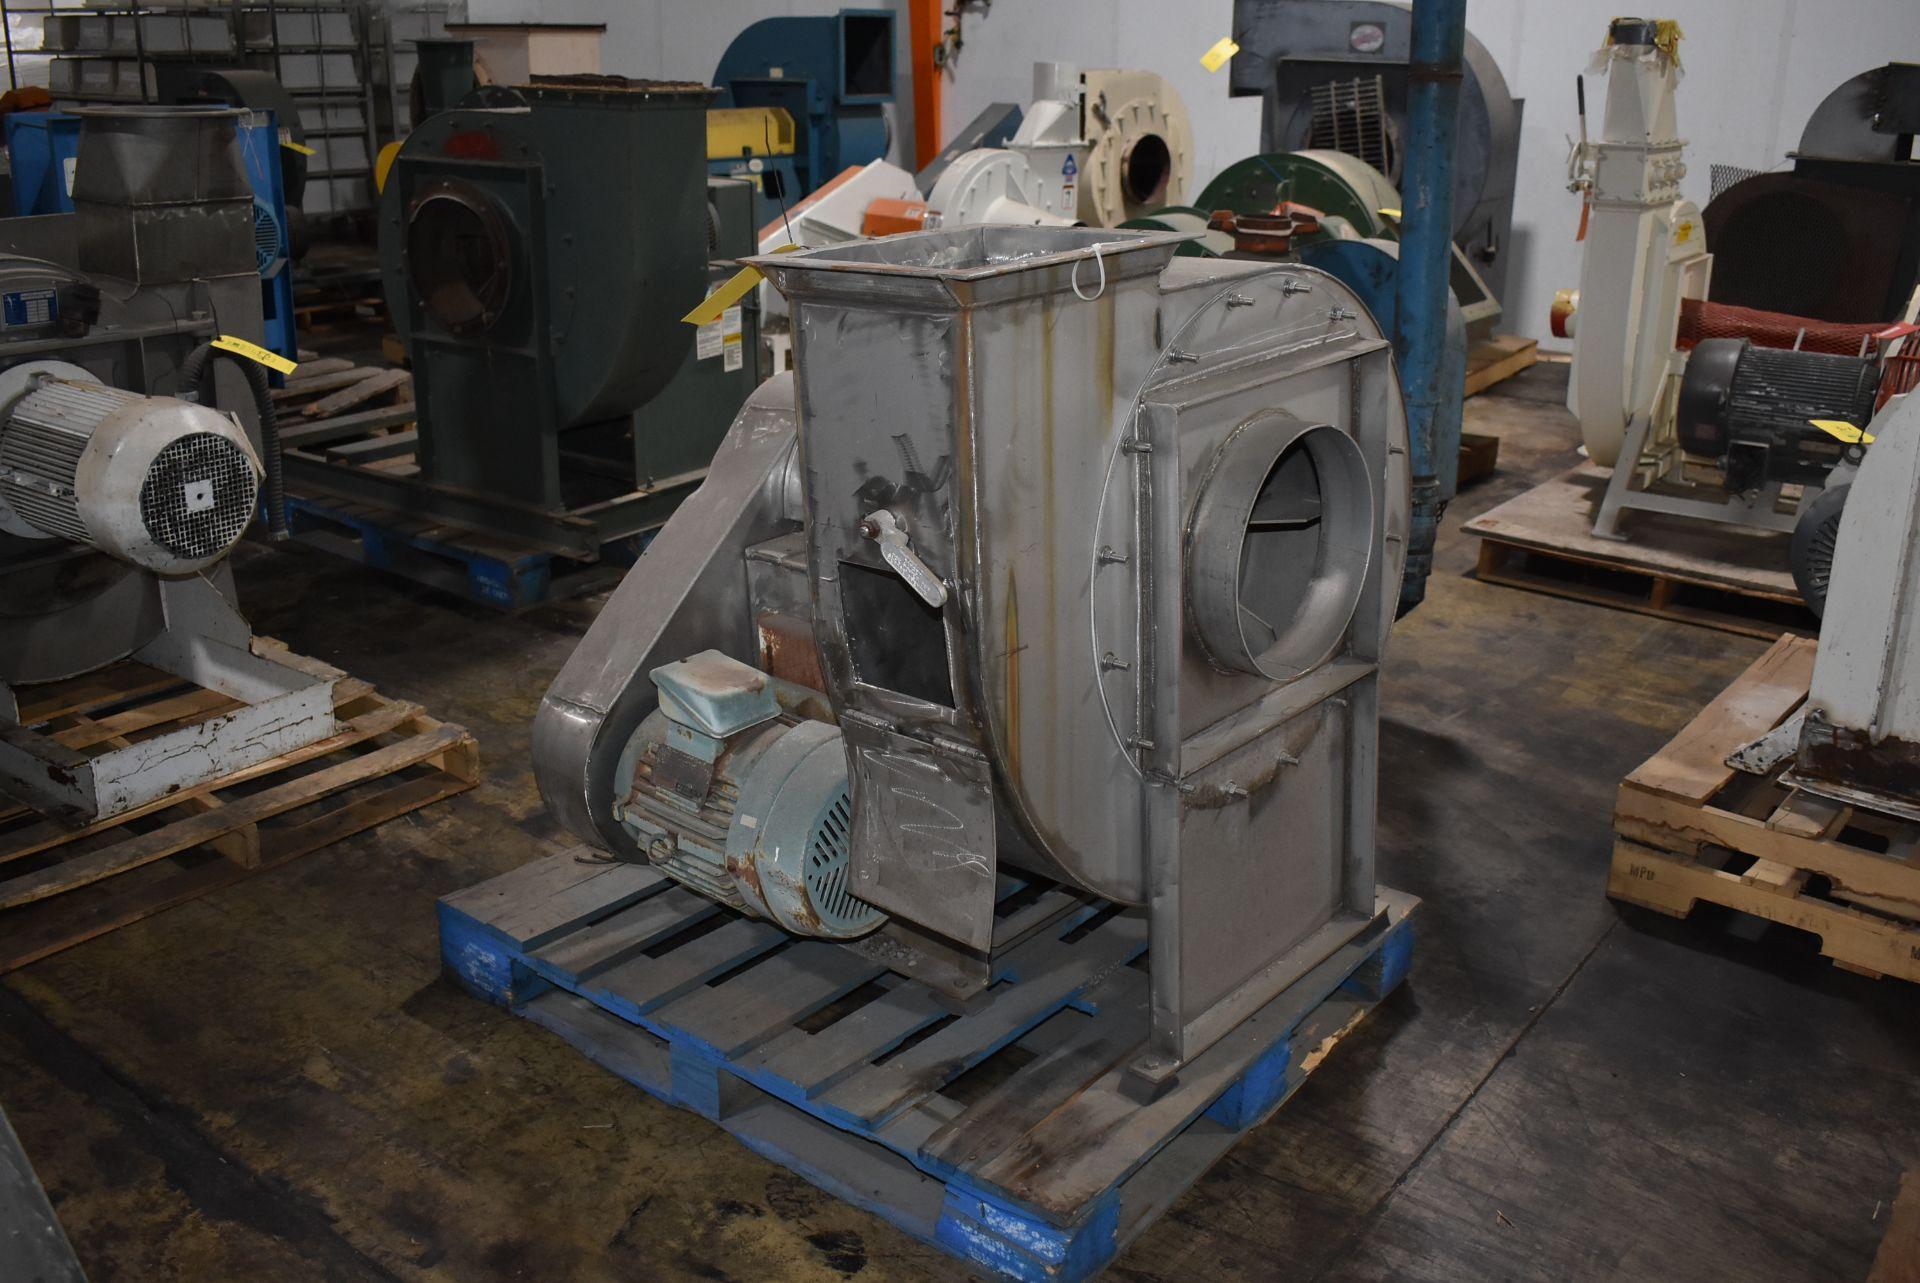 New York Blower, Series 20 GI Fan, Size 224 w/10 HP Motor, Stainless Steel Chute - Image 3 of 3